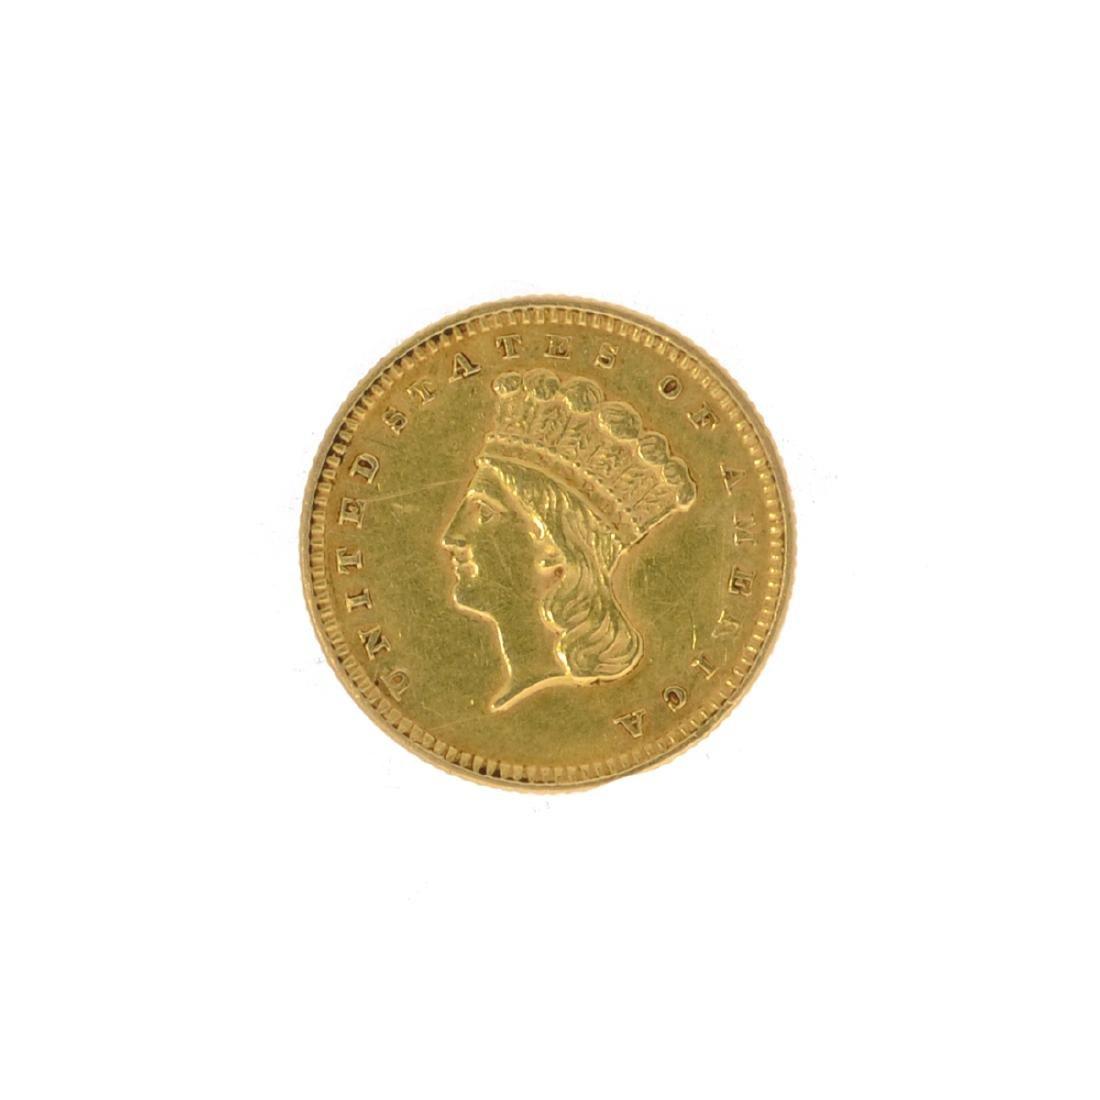 *1856 $1 U.S. Indian Head Gold Coin (JG N)